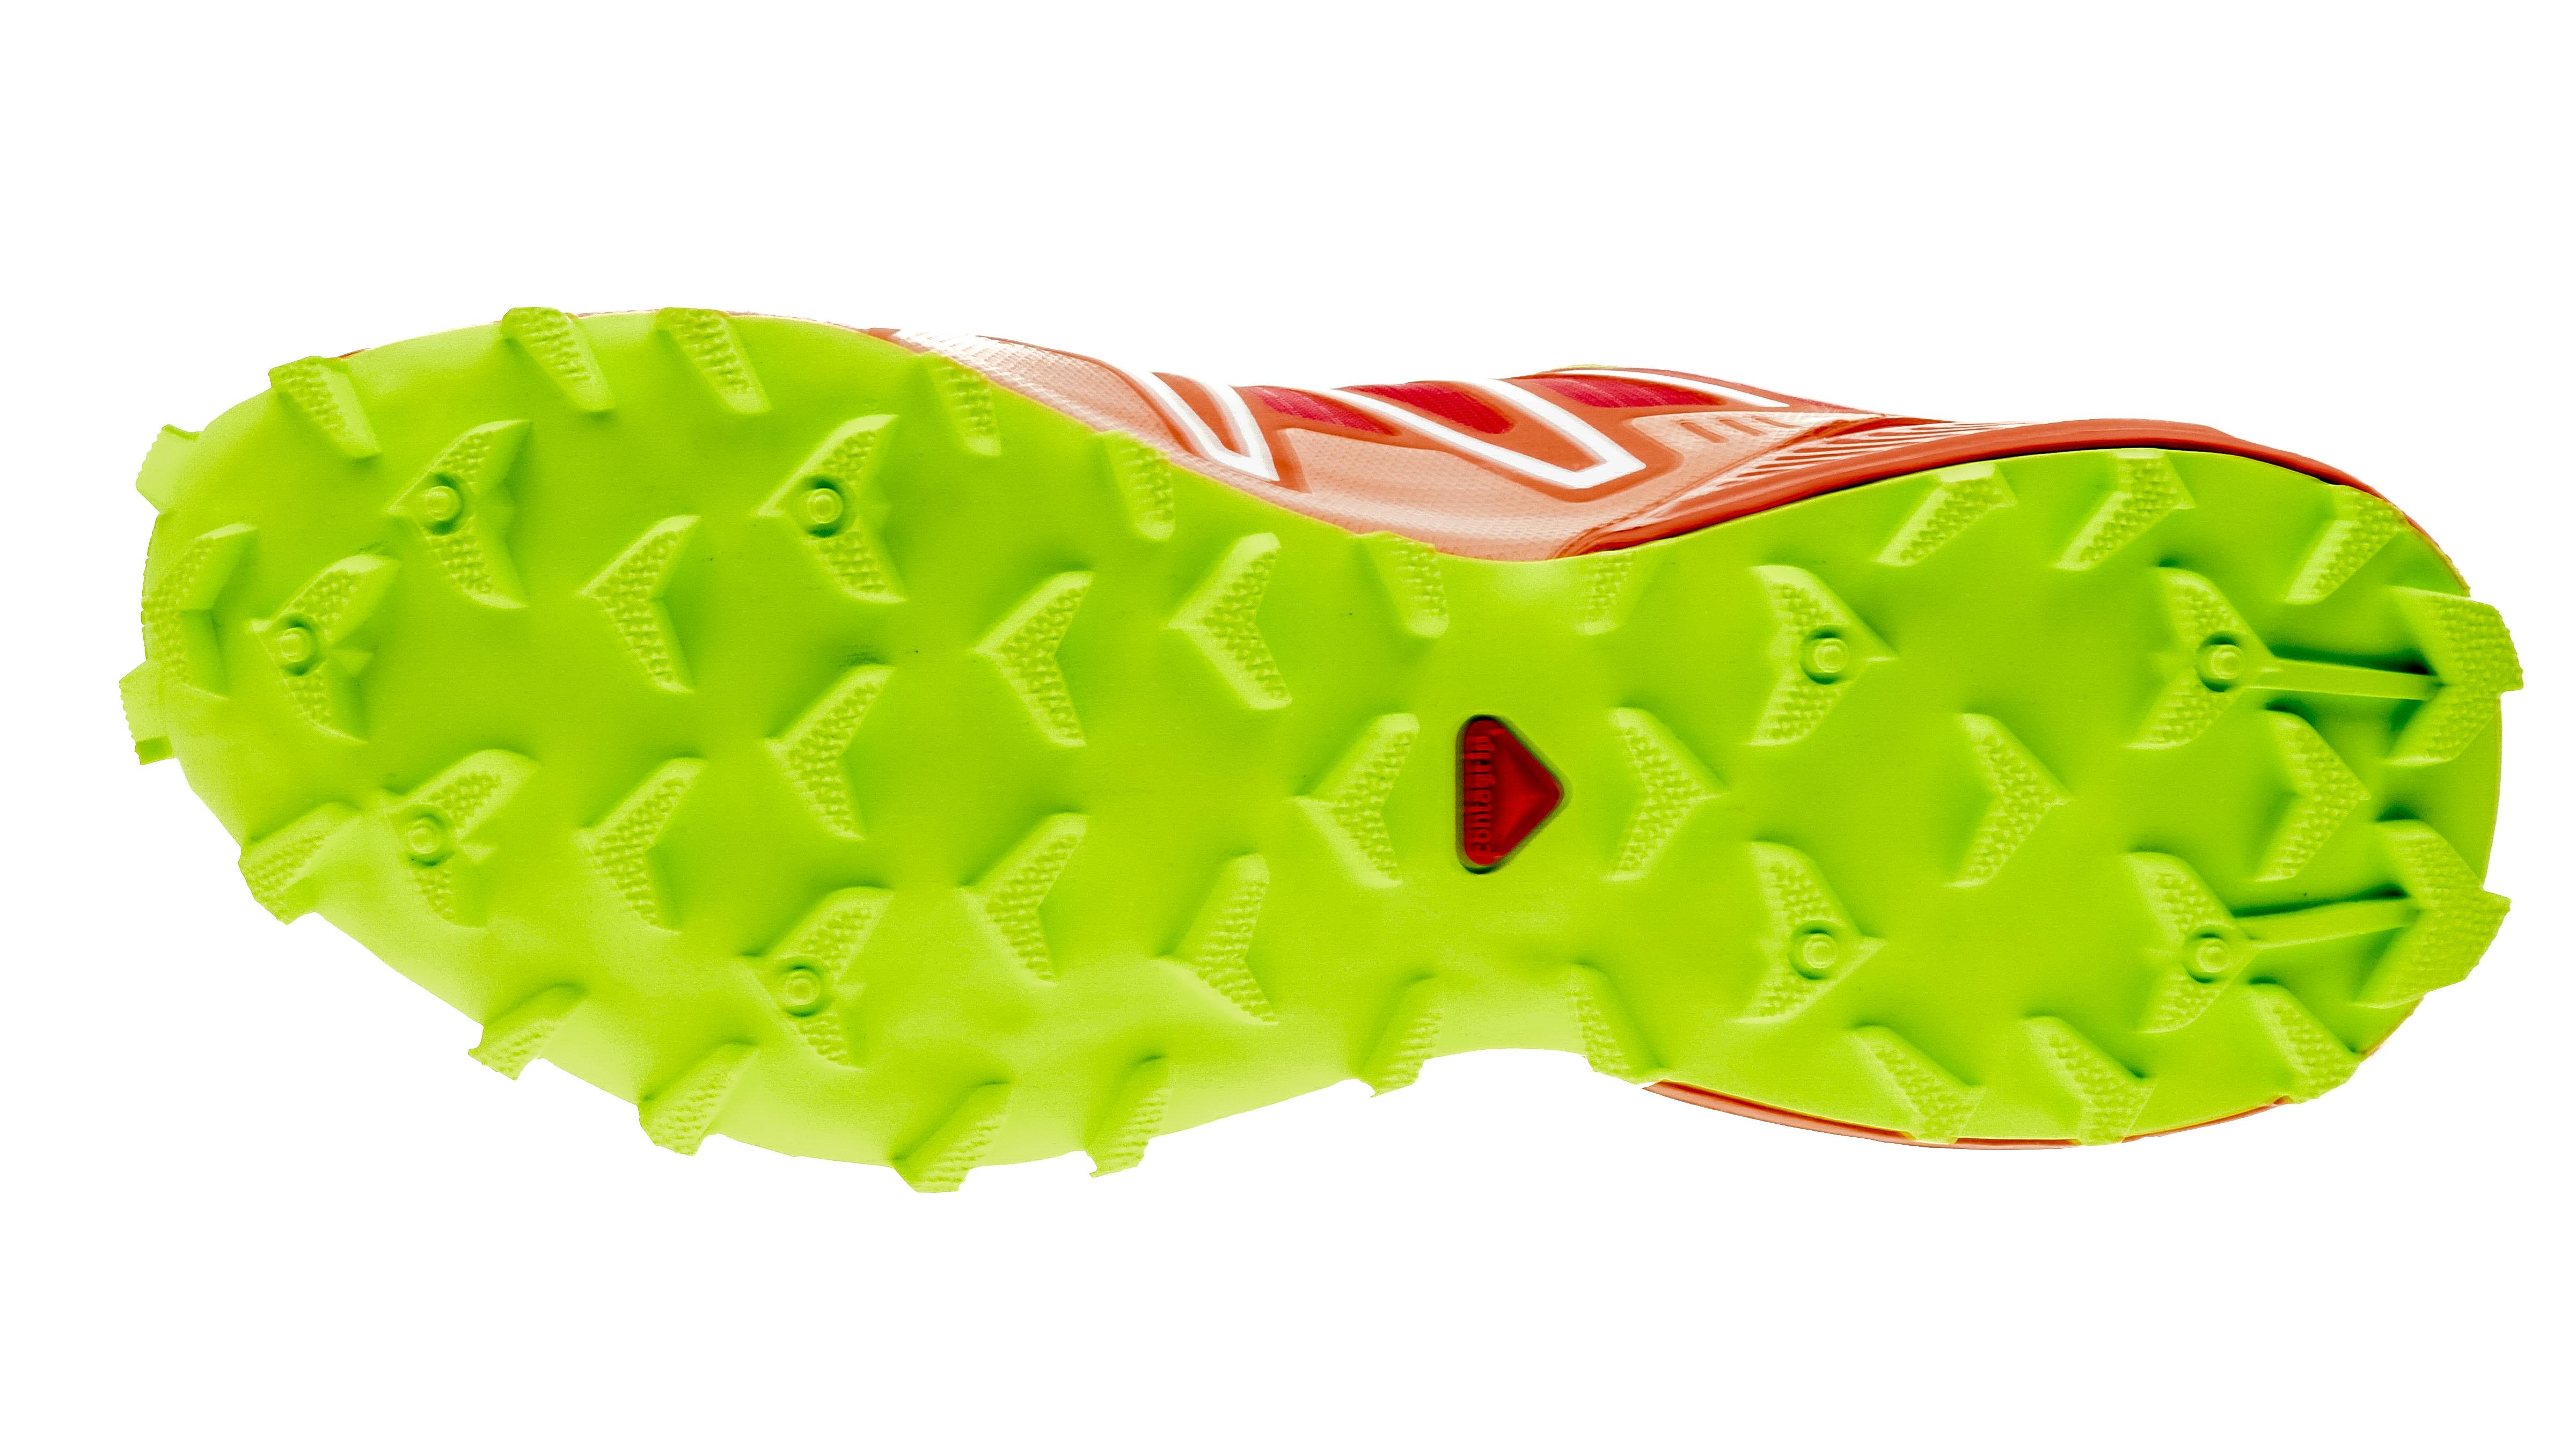 769a48f67573 Salomon Speedcross 3 W lotus-pink papaya gecko-green bestellen bij ...